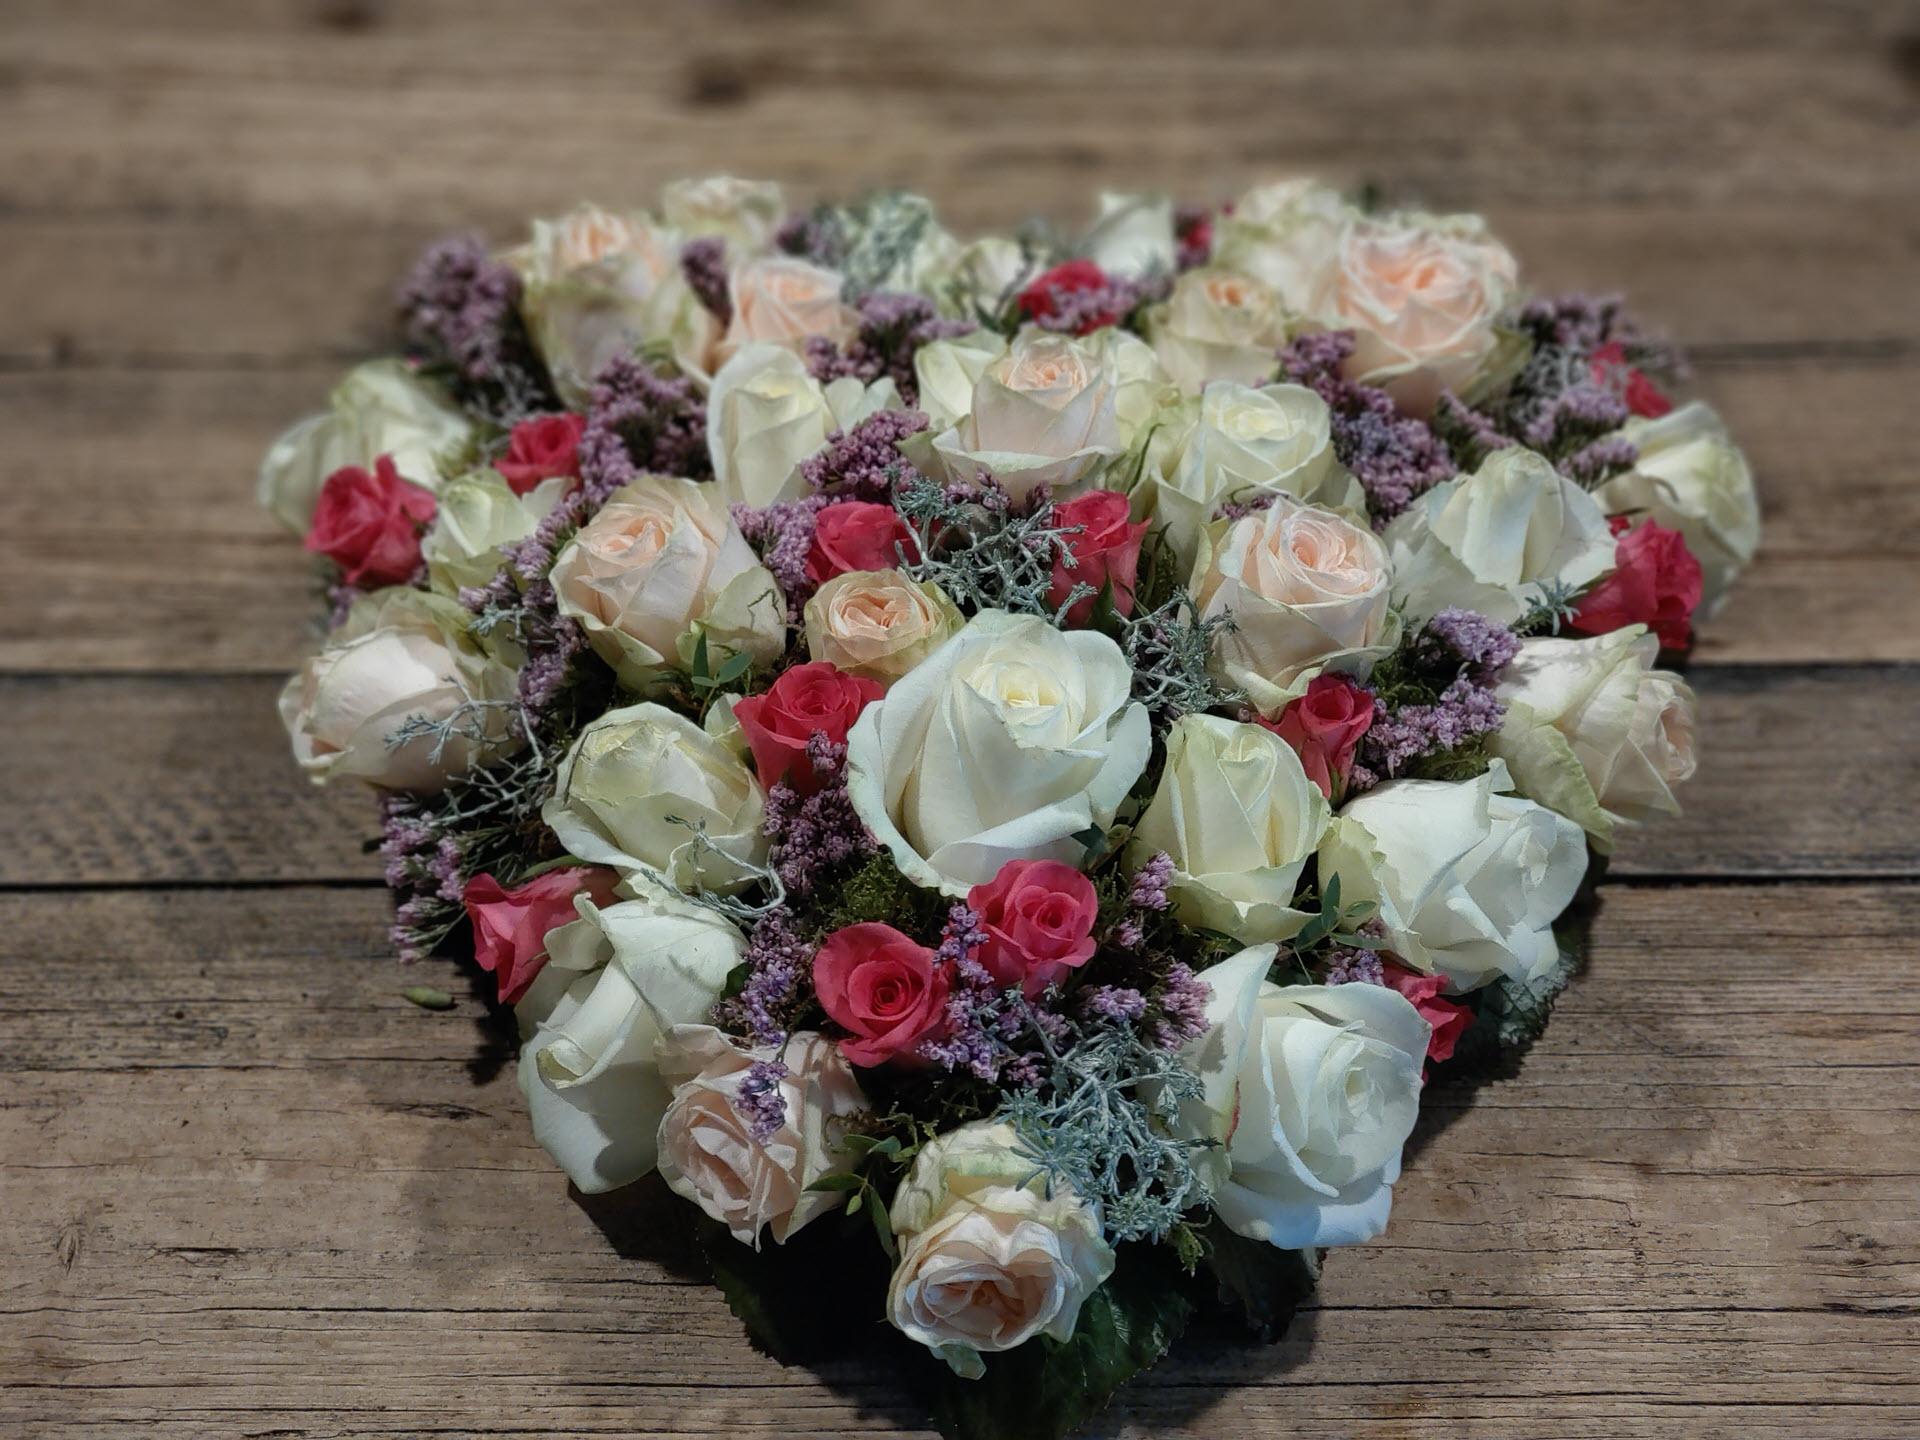 Bloemsierkunst Groeneveld rouwstuk hart